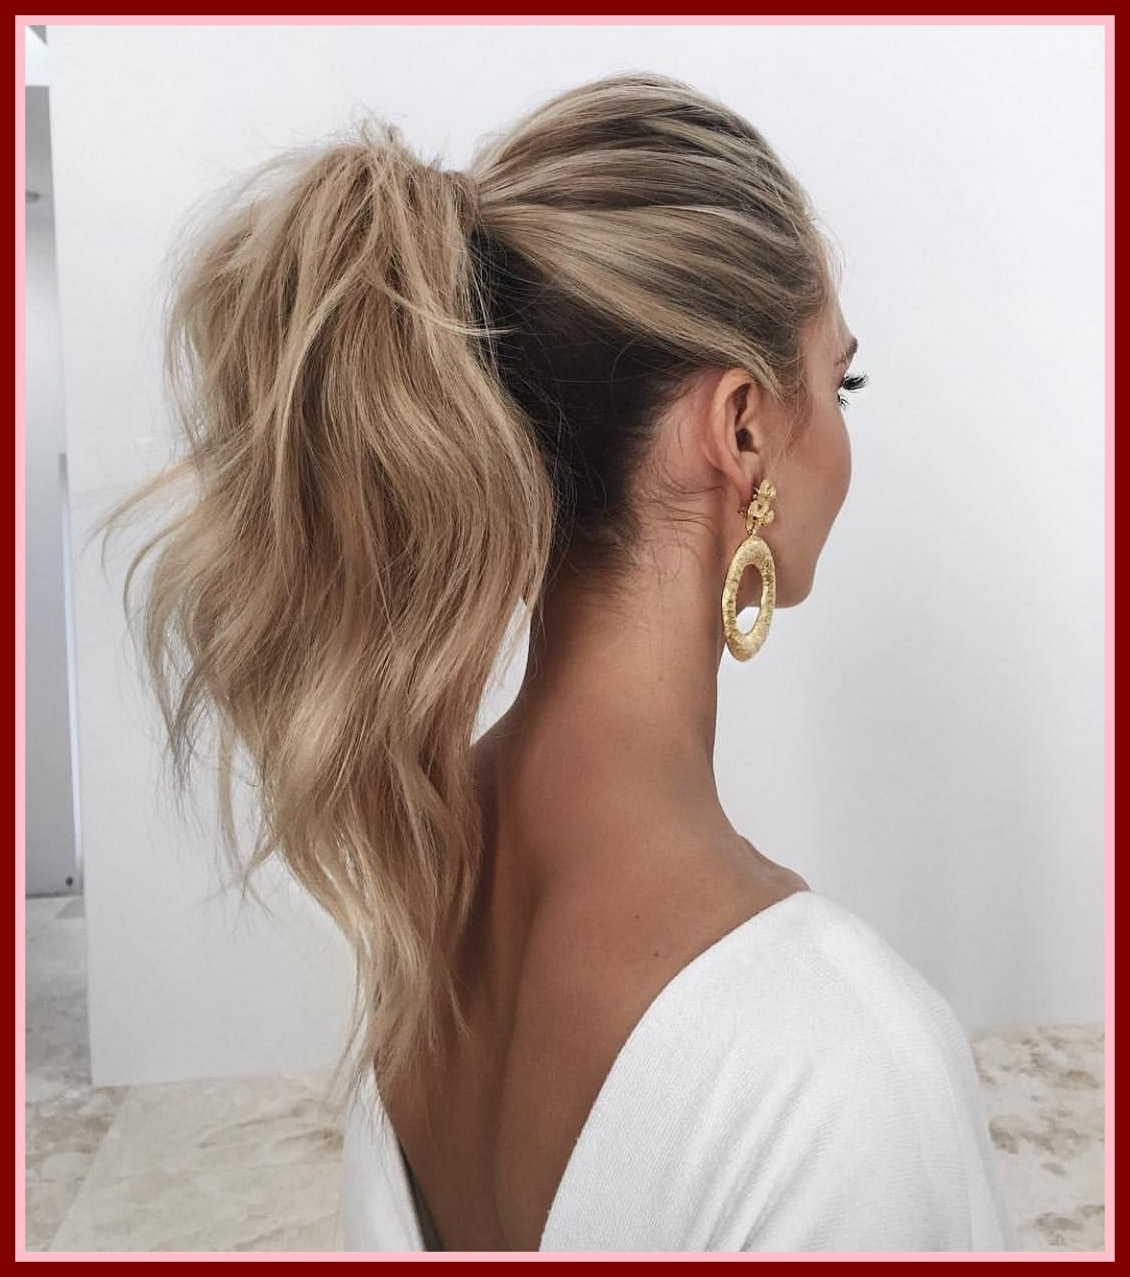 Favorite Wedding Hairstyles That Cover Ears Regarding Marvelous Best Wedding Hair Bridal Hairstyles Of To Cover Big Ears (View 7 of 15)